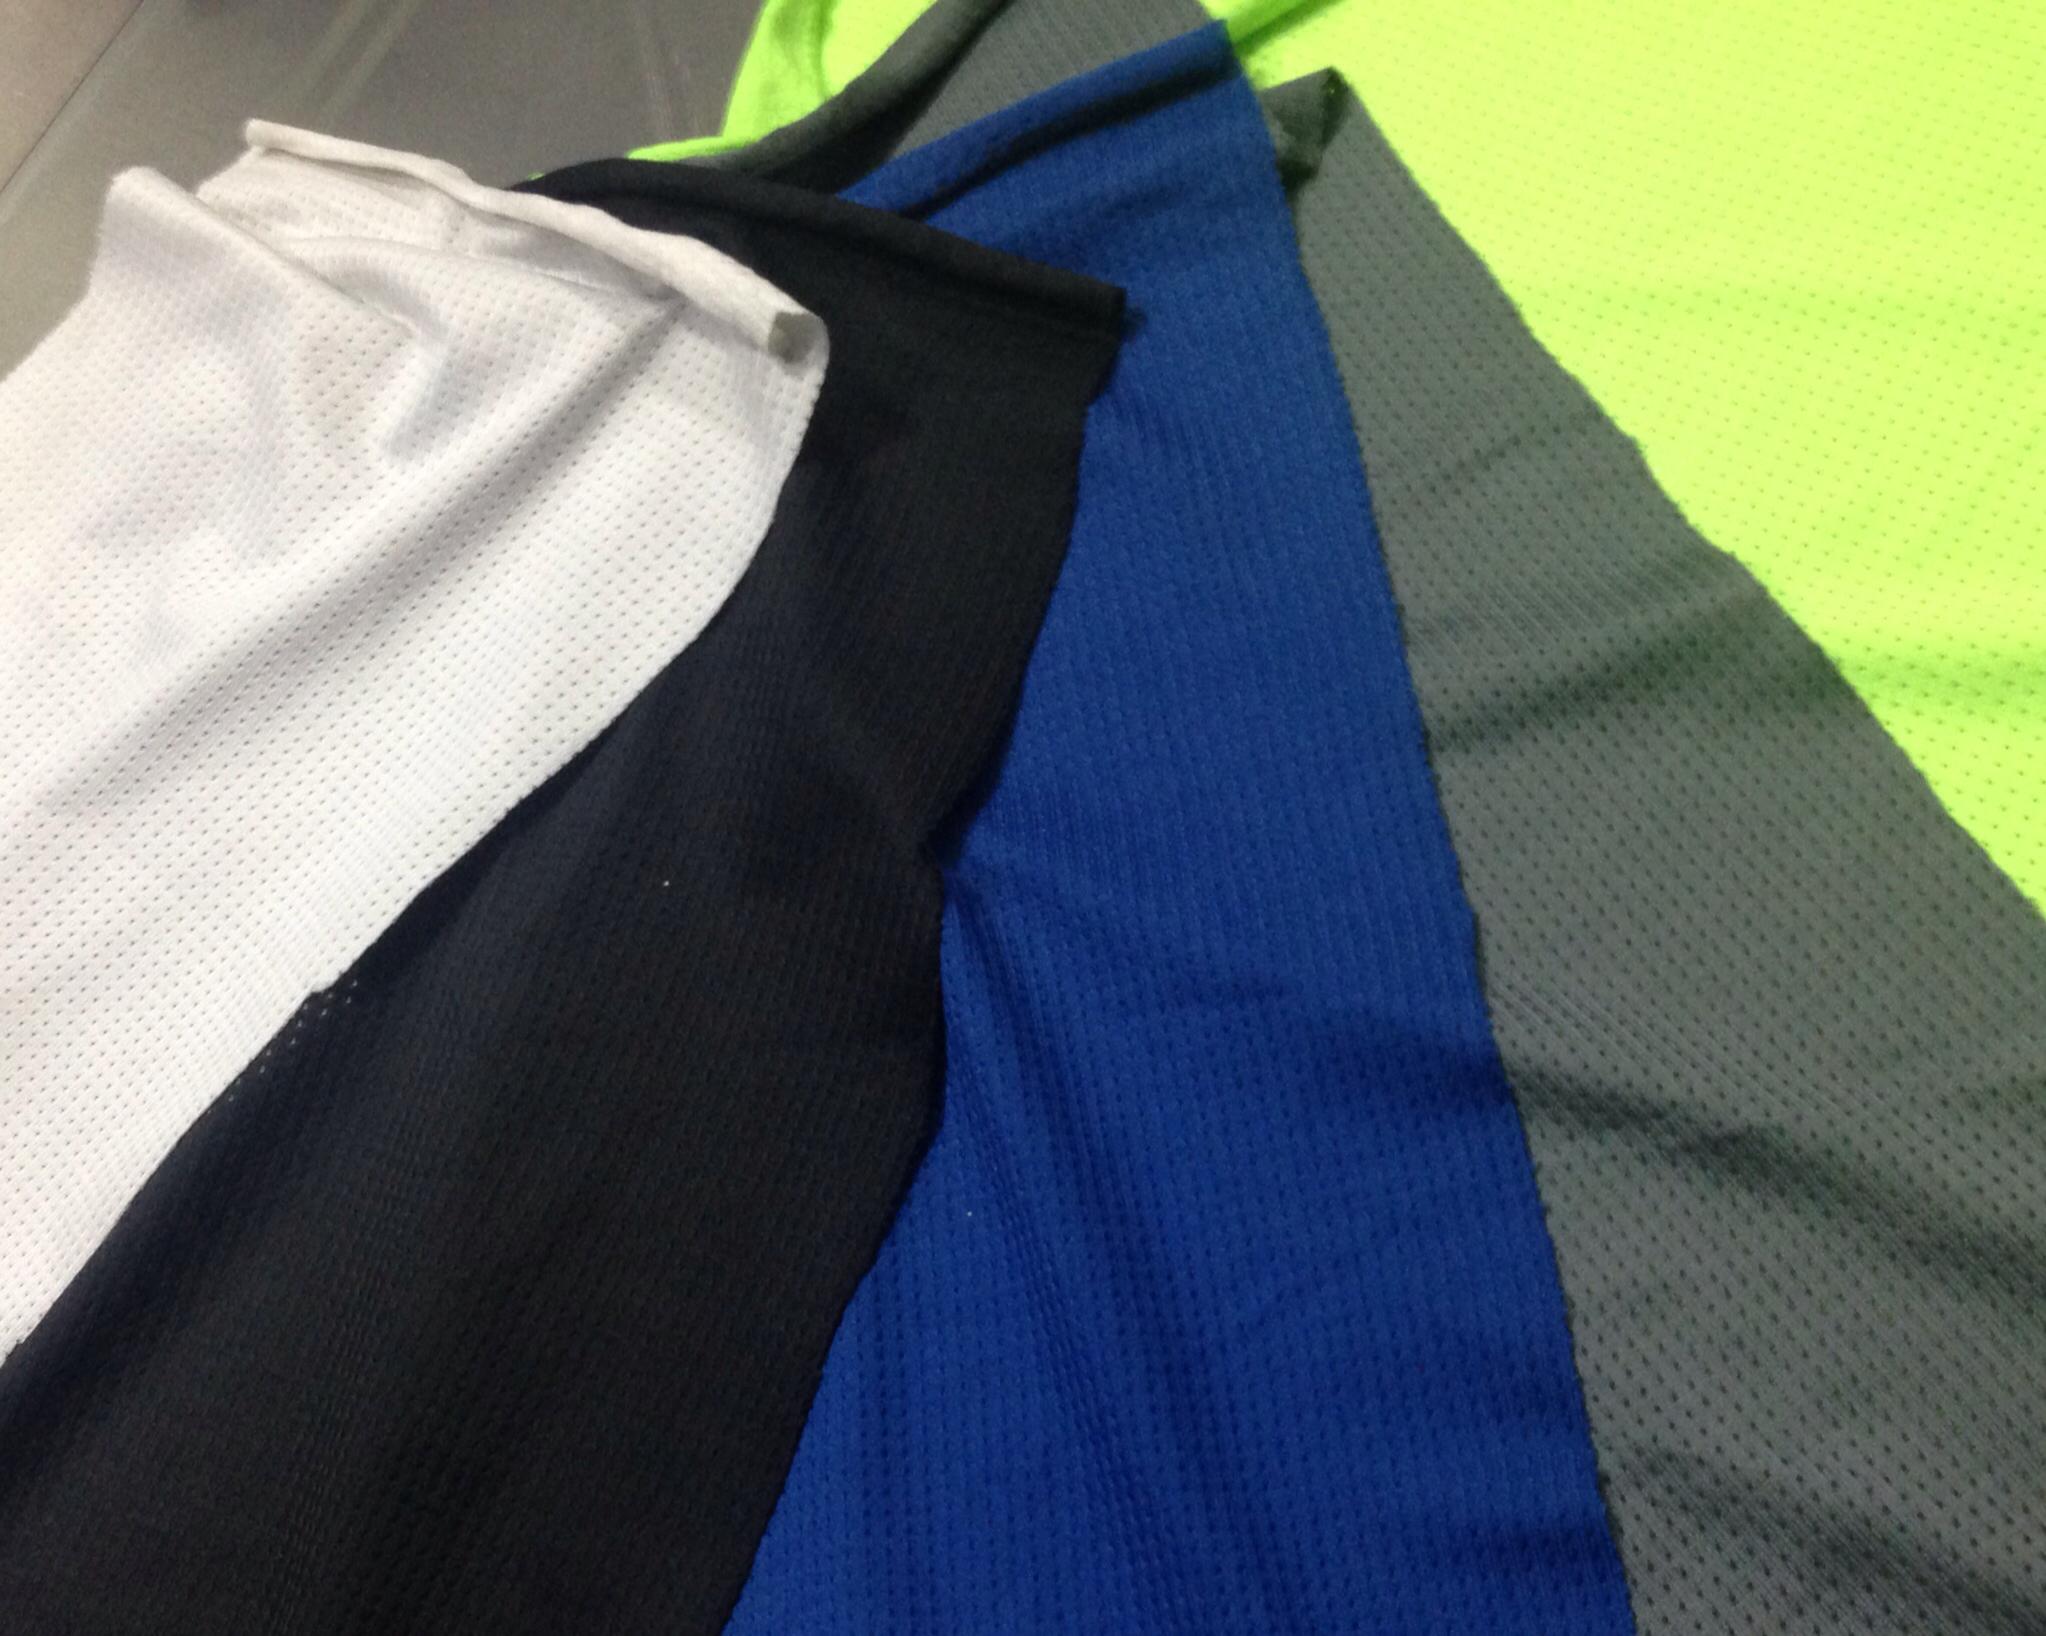 T-Shirt Fabric